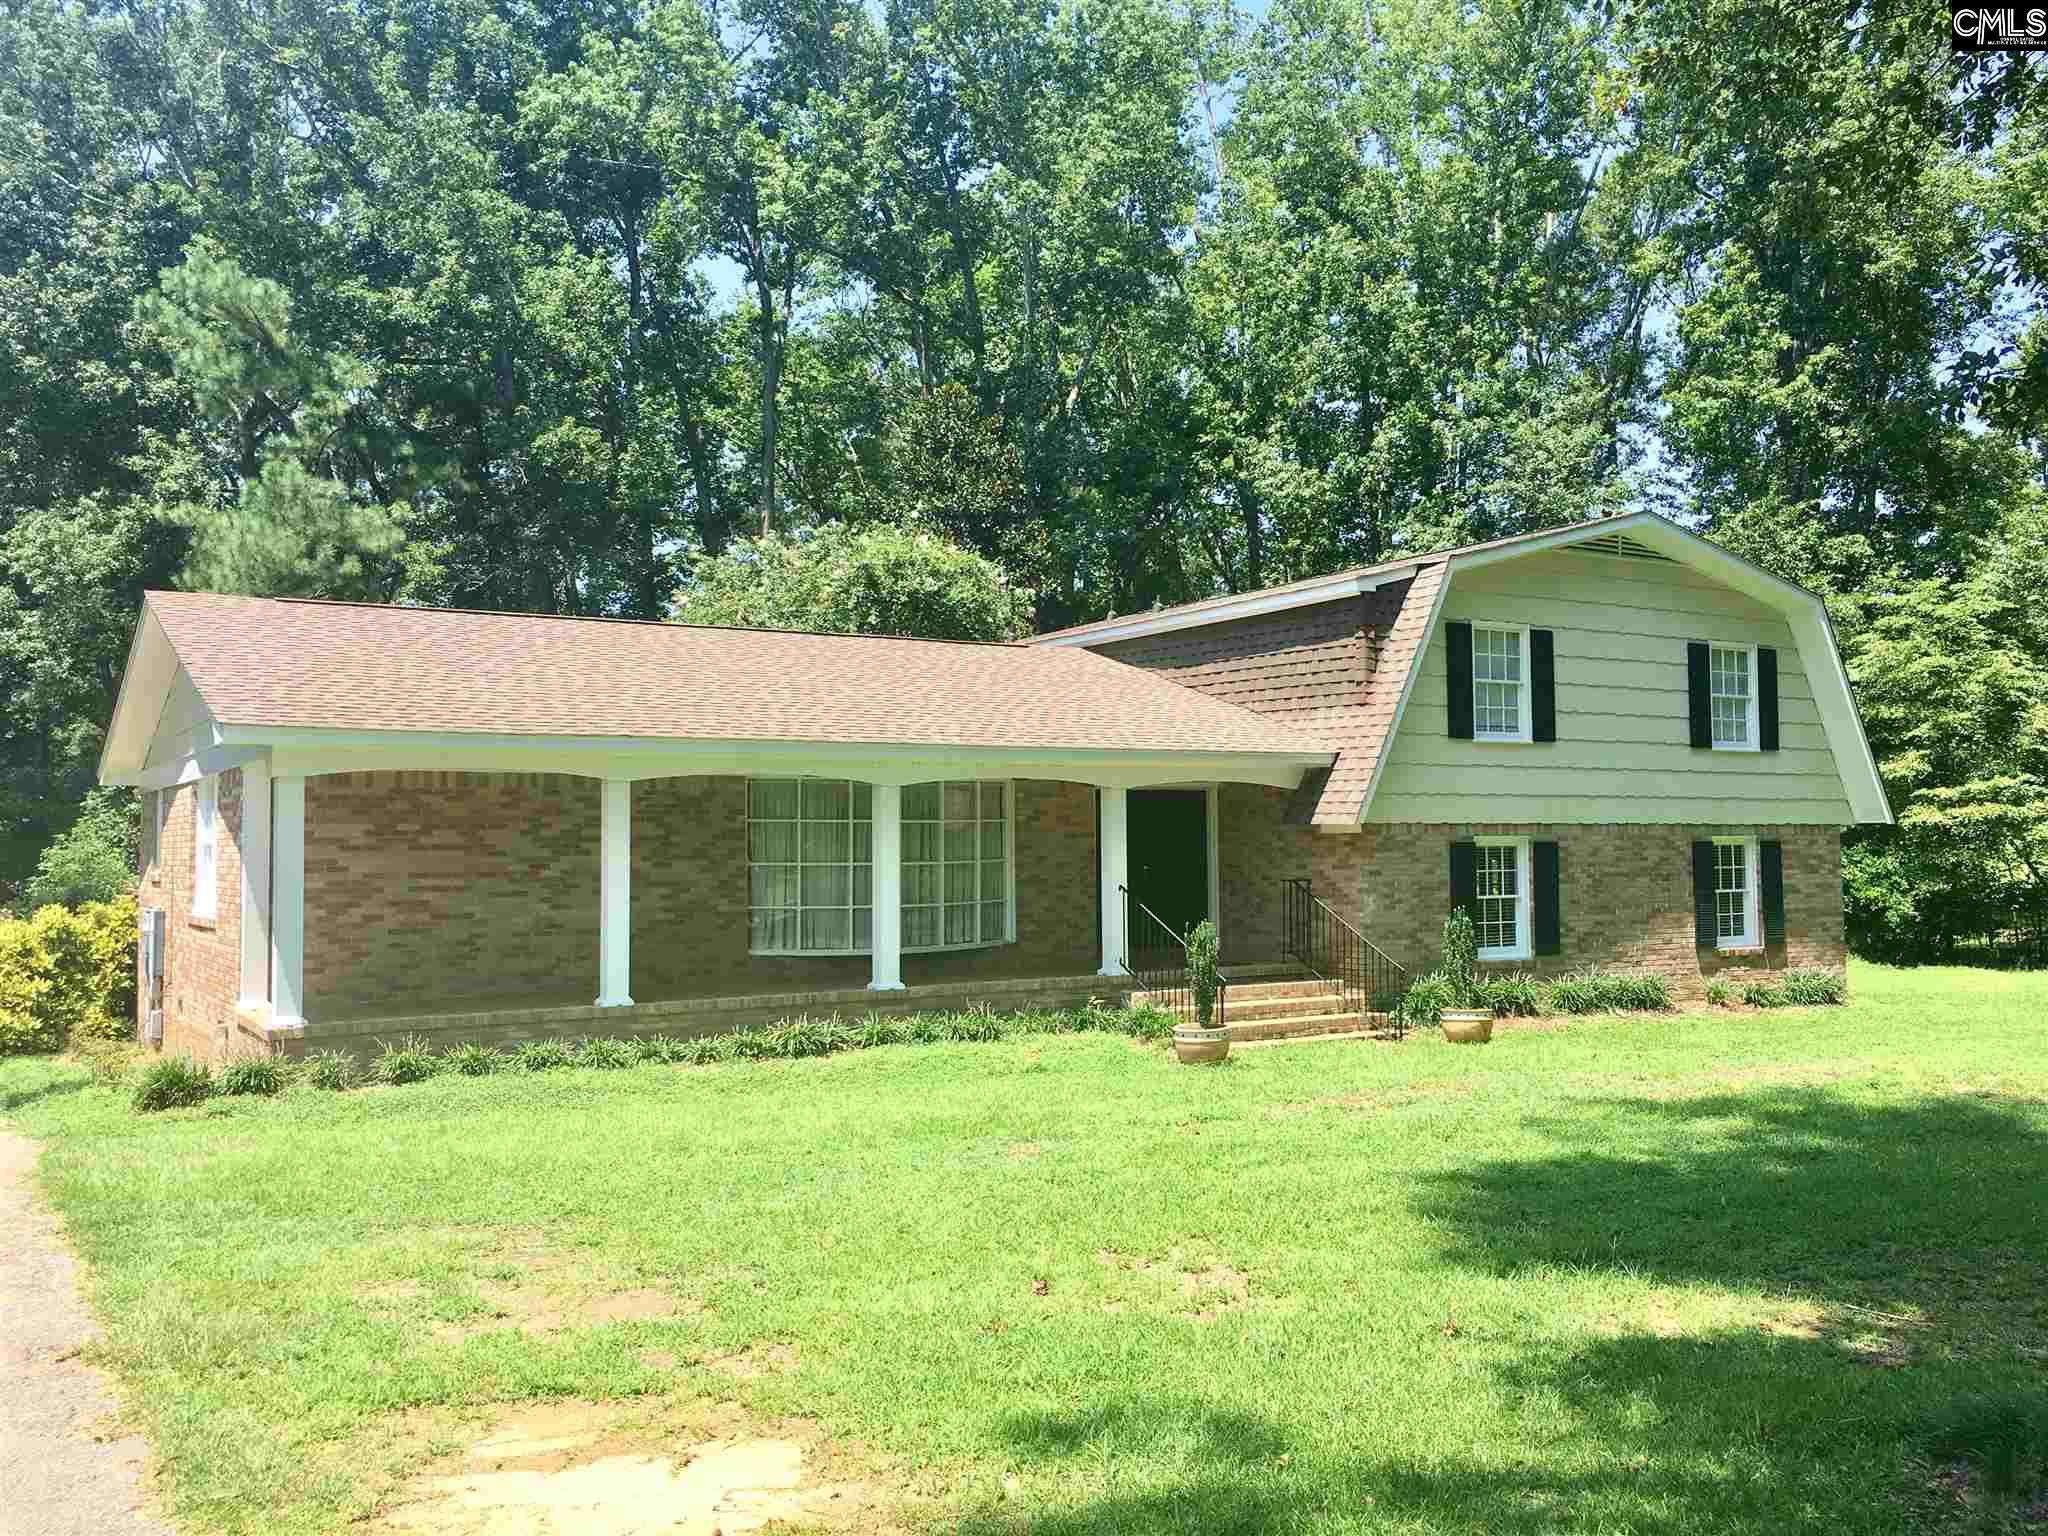 225  Hunting Creek Hopkins, SC 29061-9493